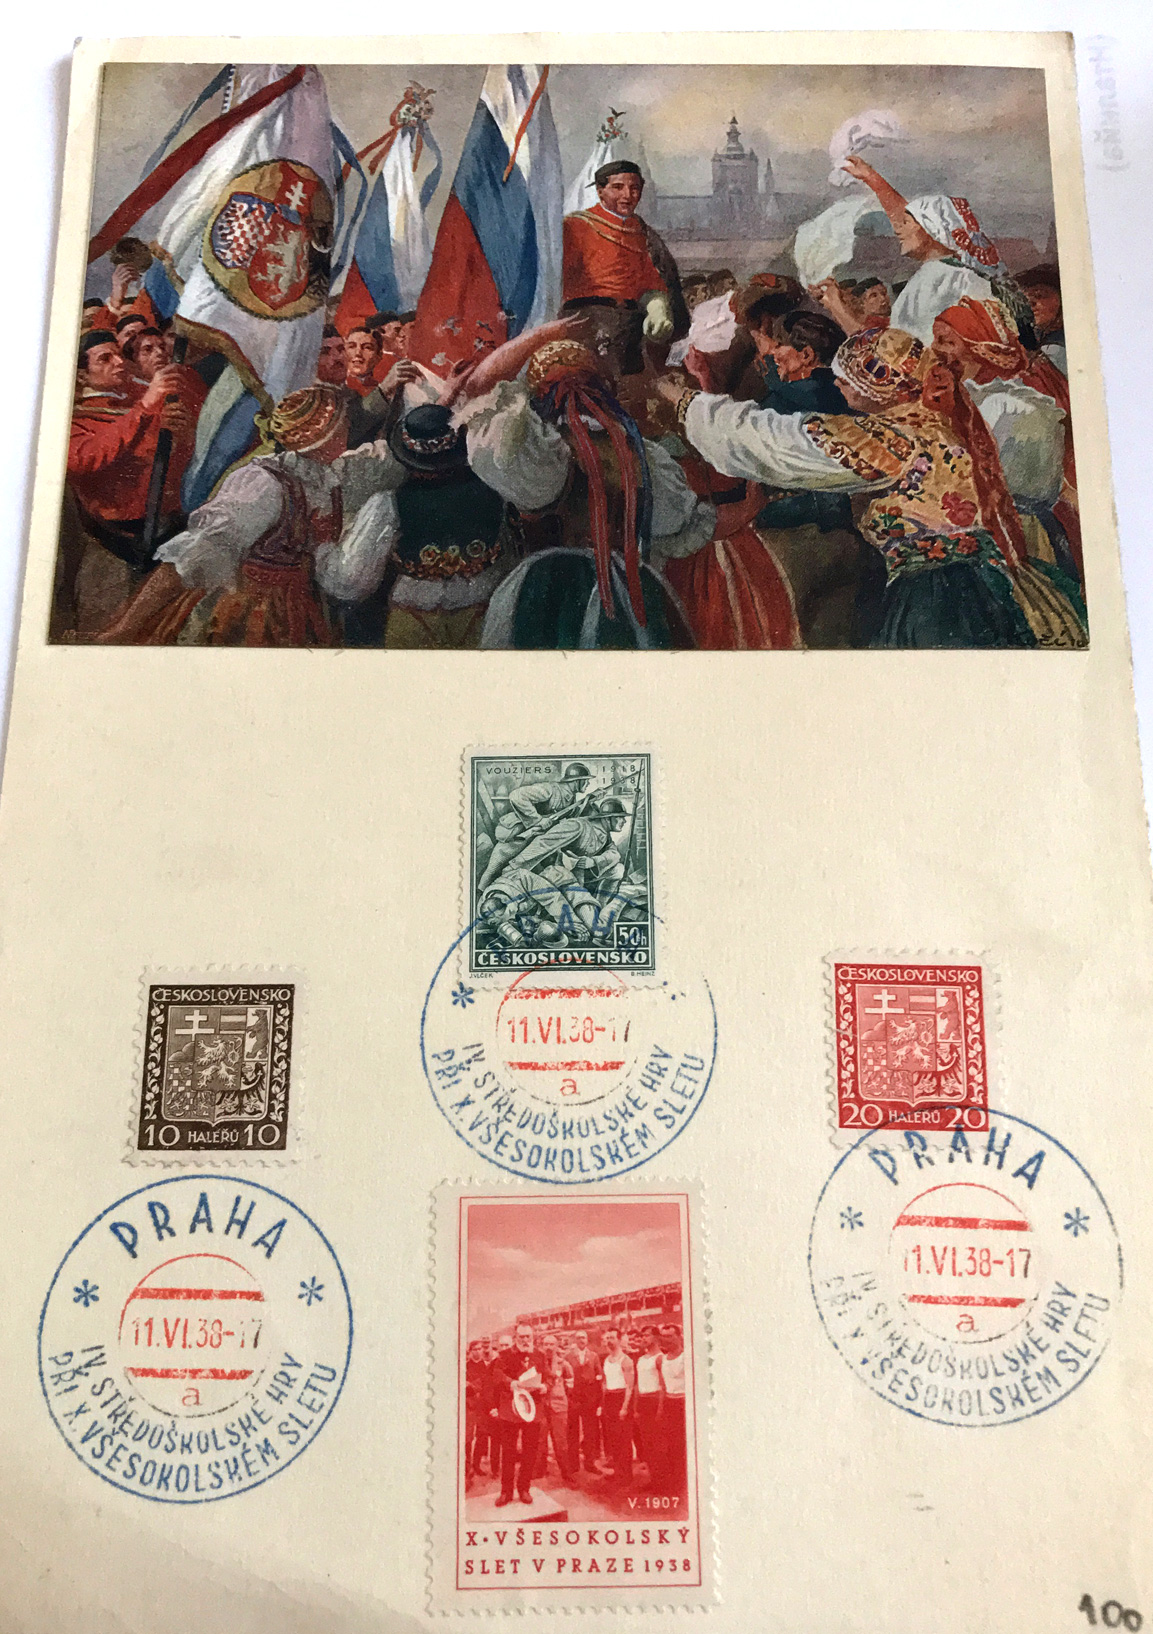 Svesokolski slet, Prag 1938, razglednica sa markicama (od saradnika Antonello Razza)